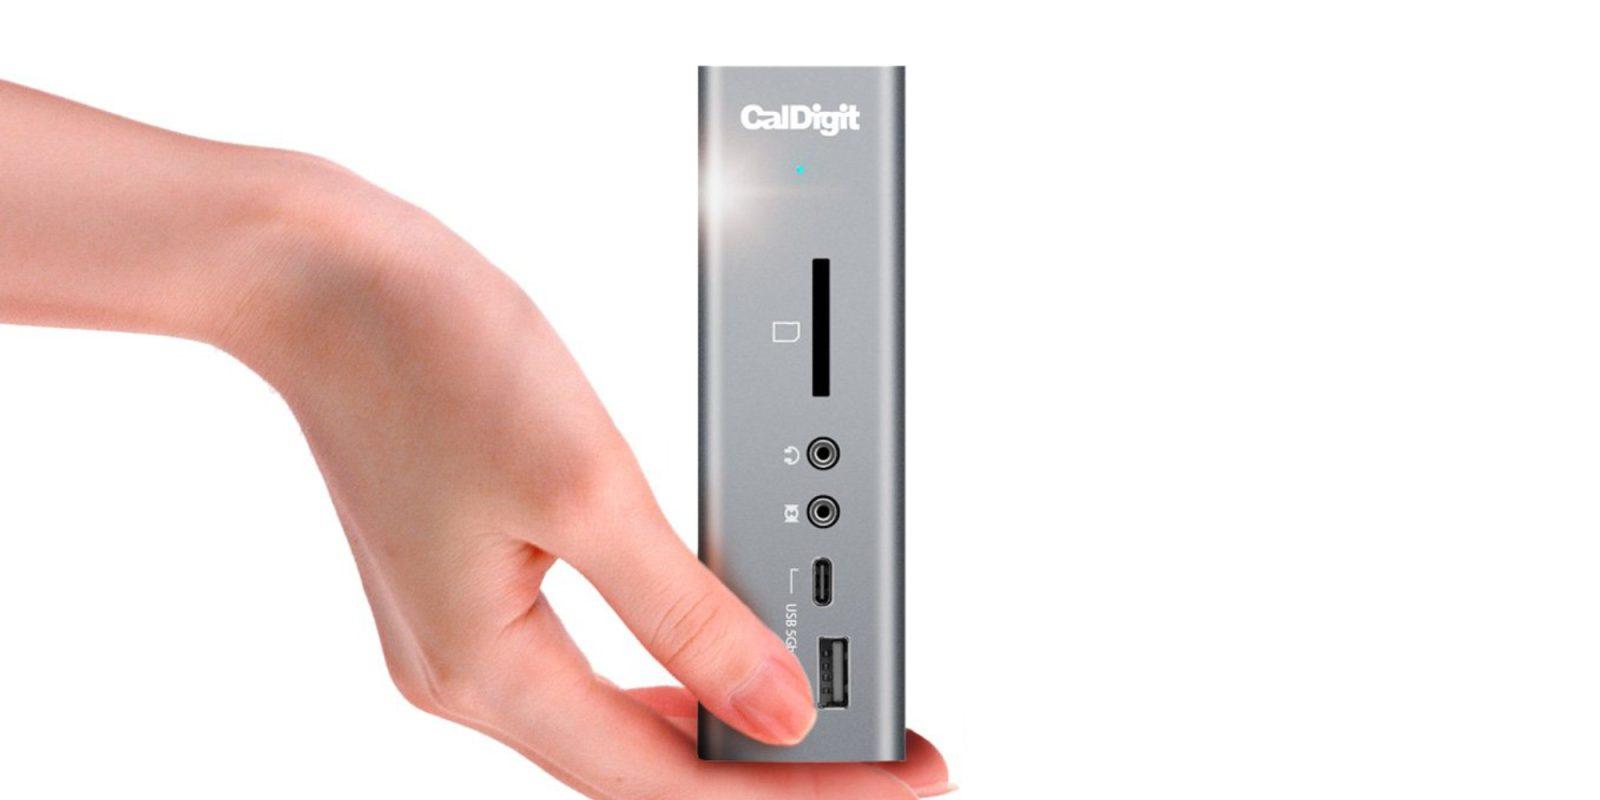 CalDigit's Thunderbolt 3 Dock has 15 ports, dual 4K60 support: $230.50 (New low)